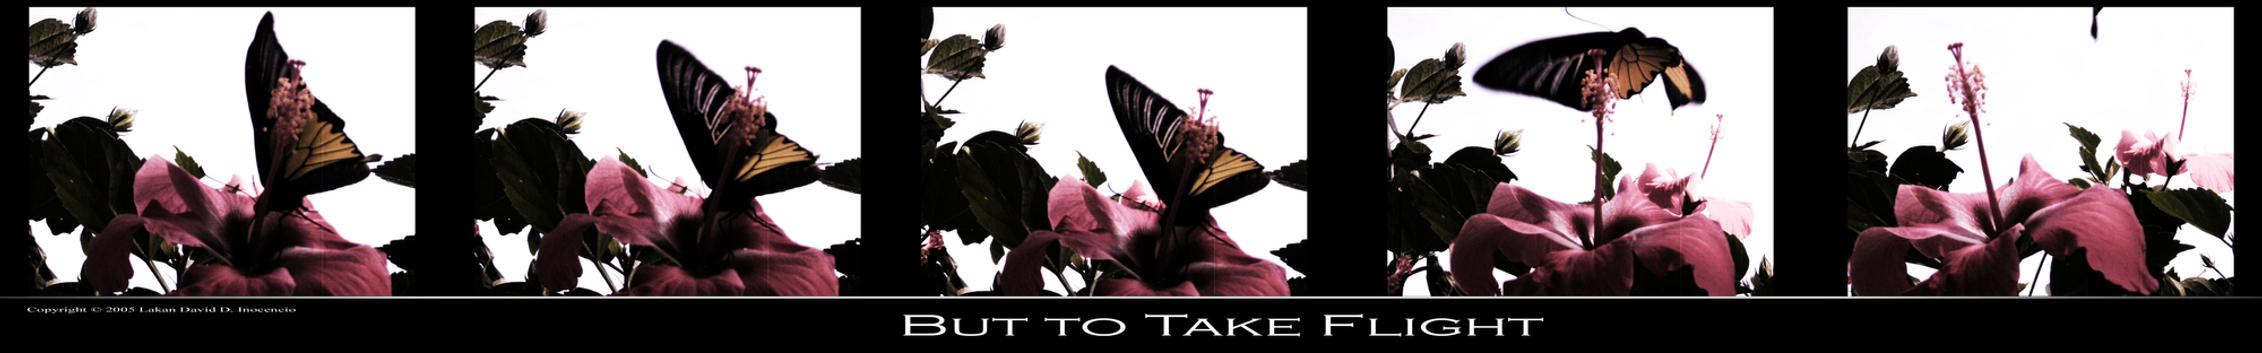 But to Take Flight by lakan-inocencio